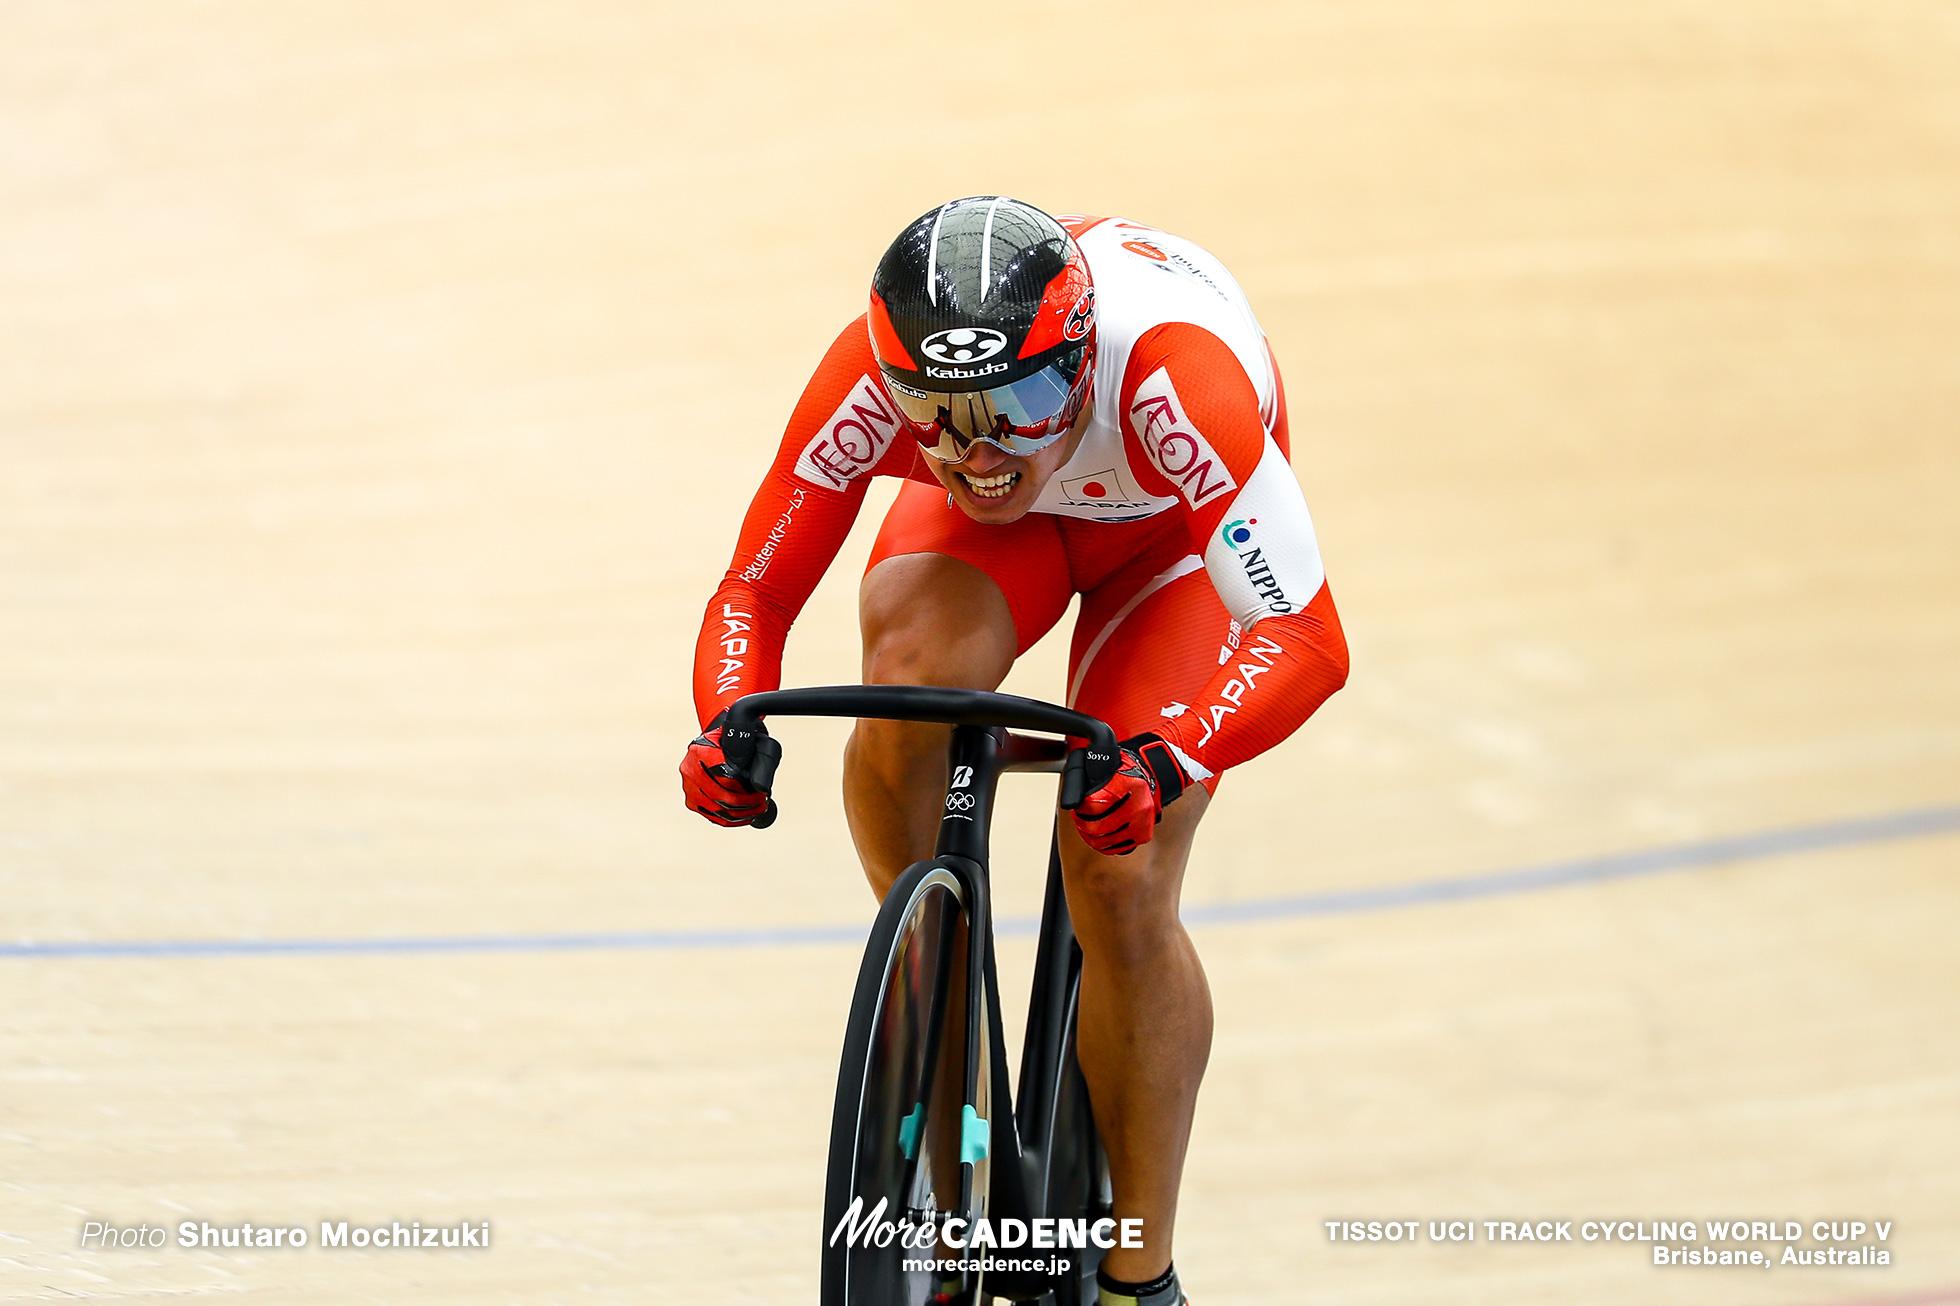 Qualifying / Men's Sprint / TISSOT UCI TRACK CYCLING WORLD CUP V, Brisbane, Australia, 脇本雄太